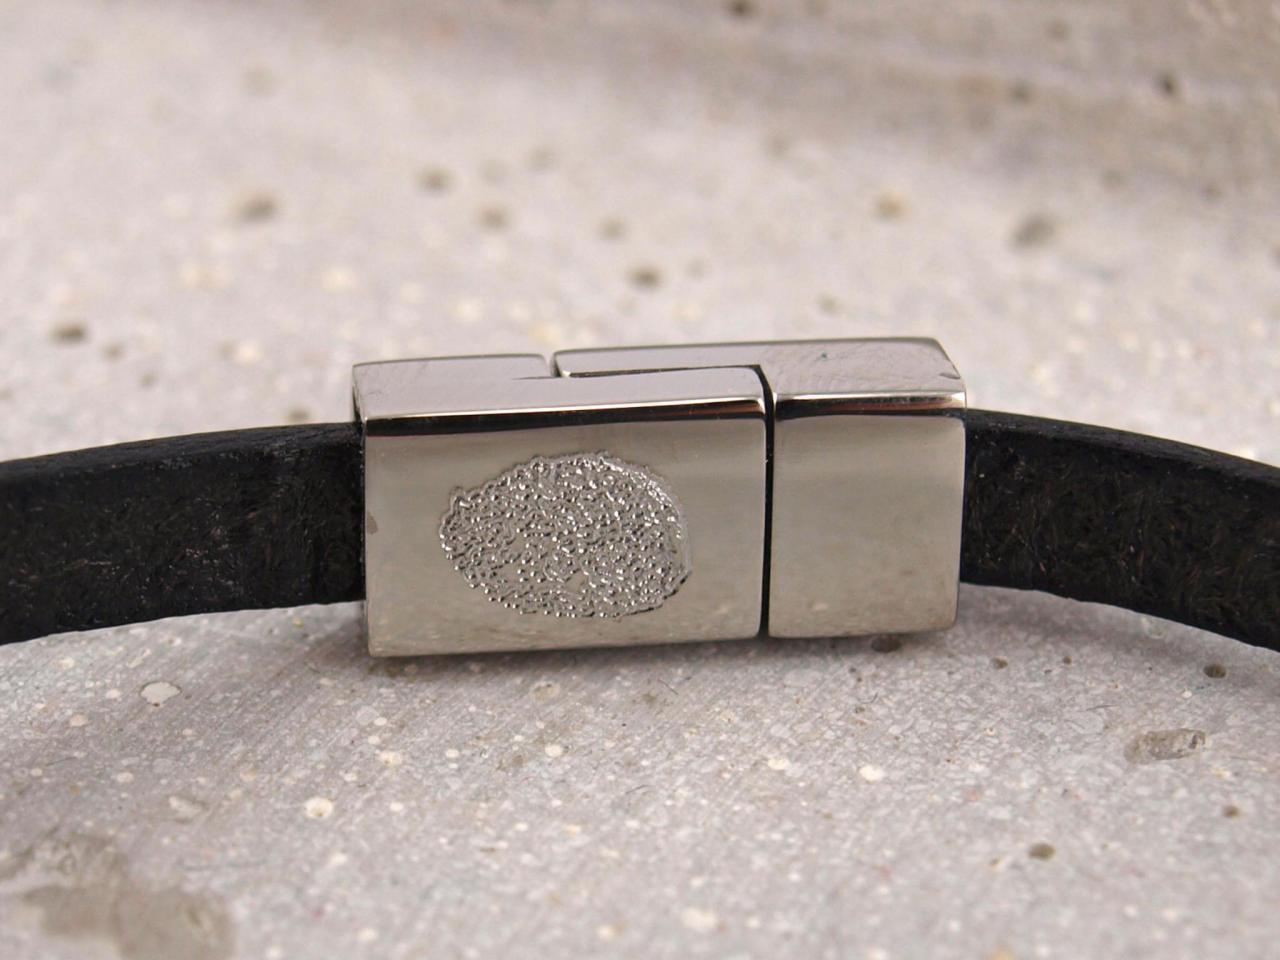 Nici Lederarmband Gravur auf Verschluss Edelstahl Eckig Fingerabdruck